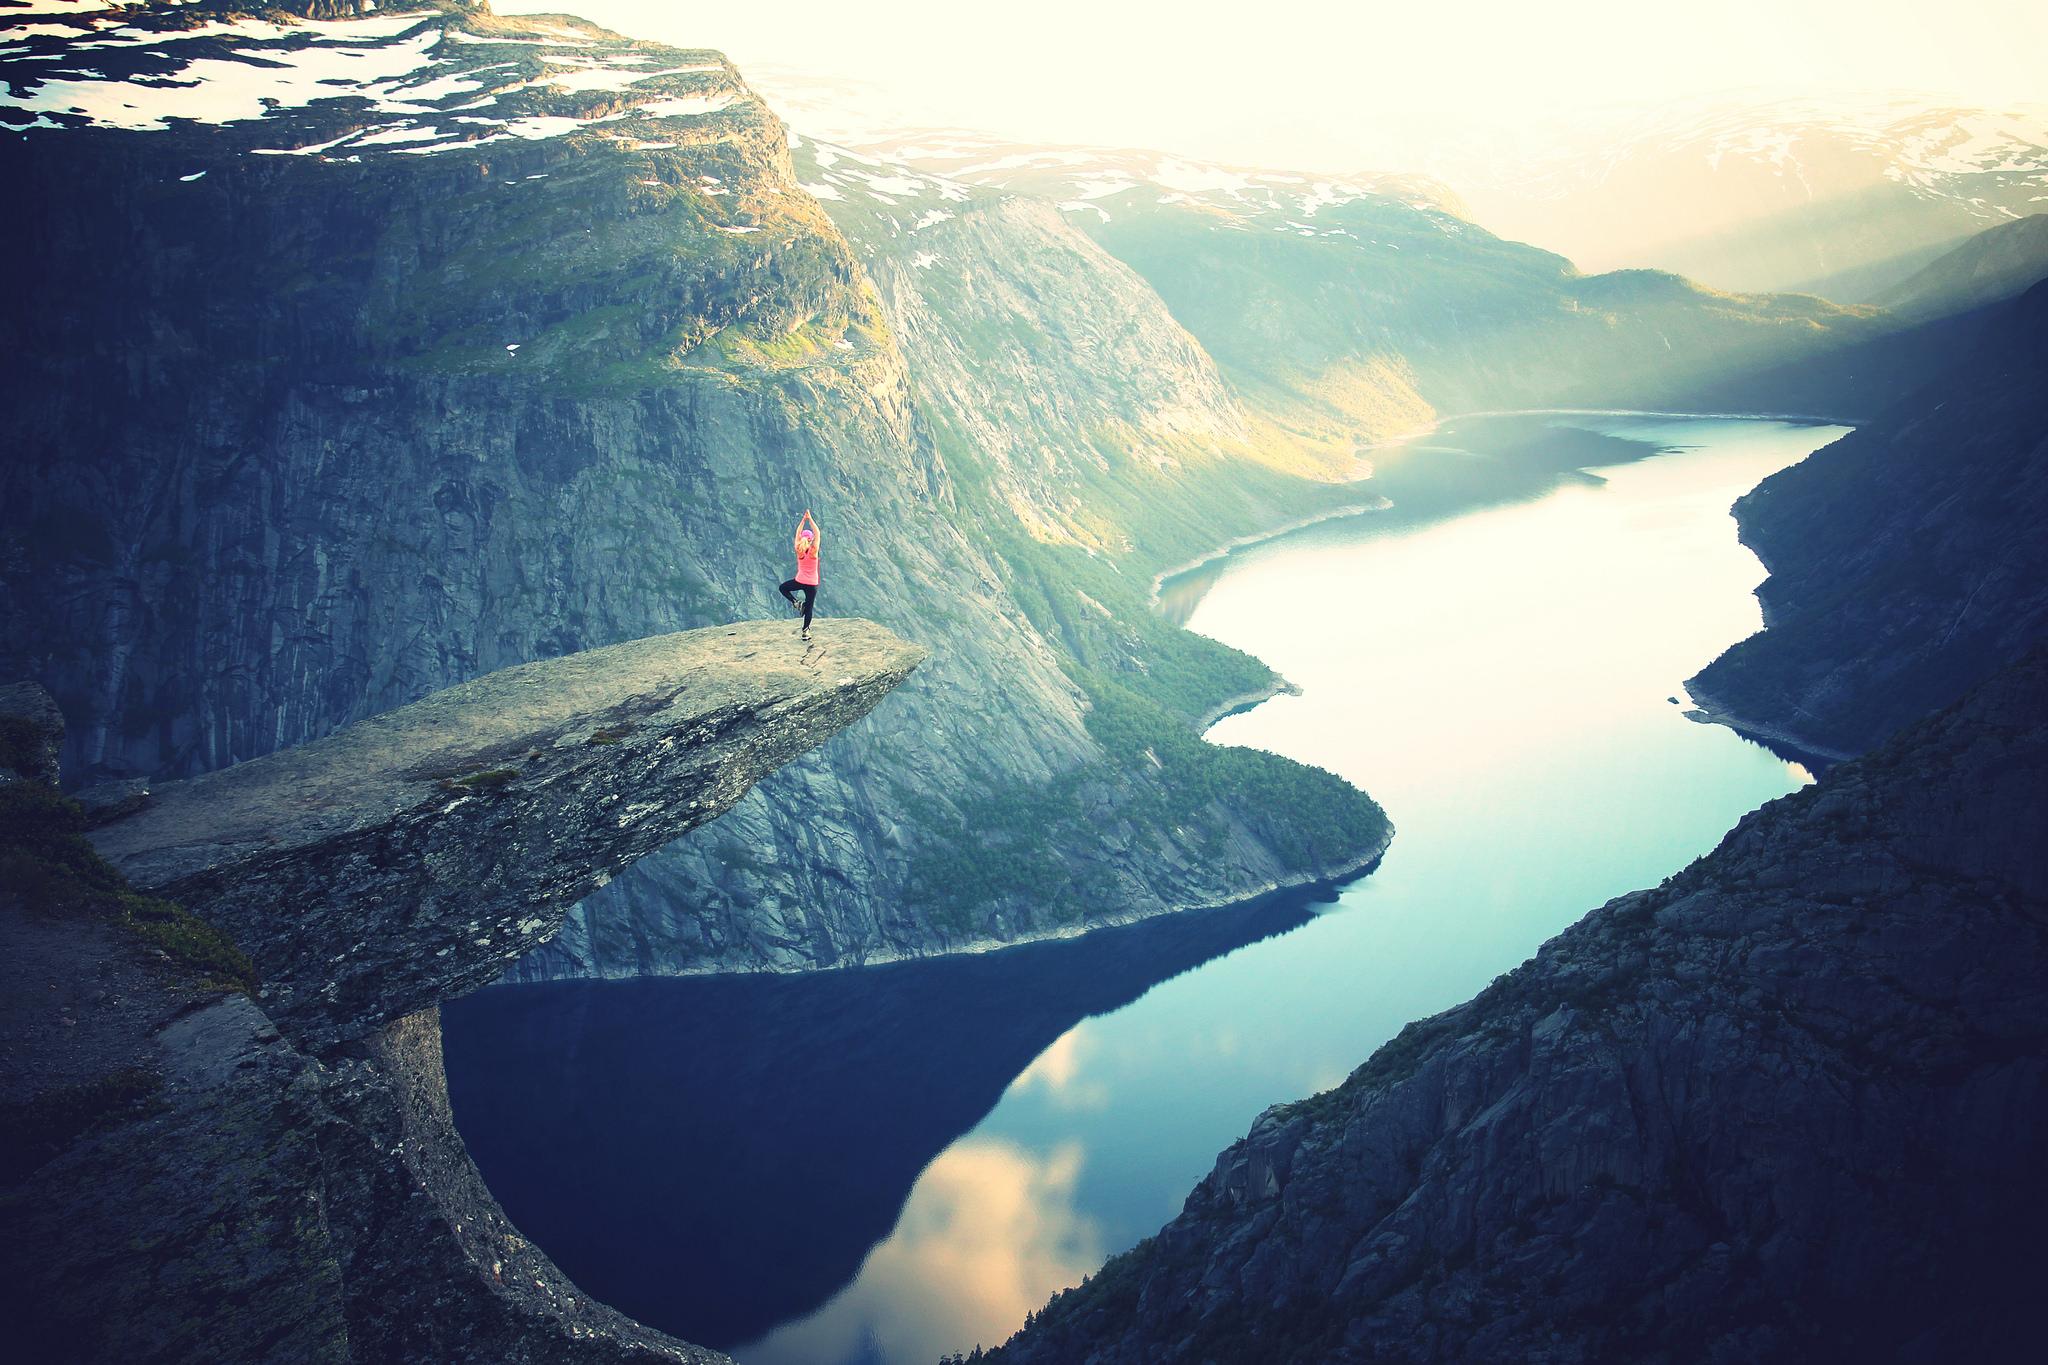 Frau meditiert auf Berg